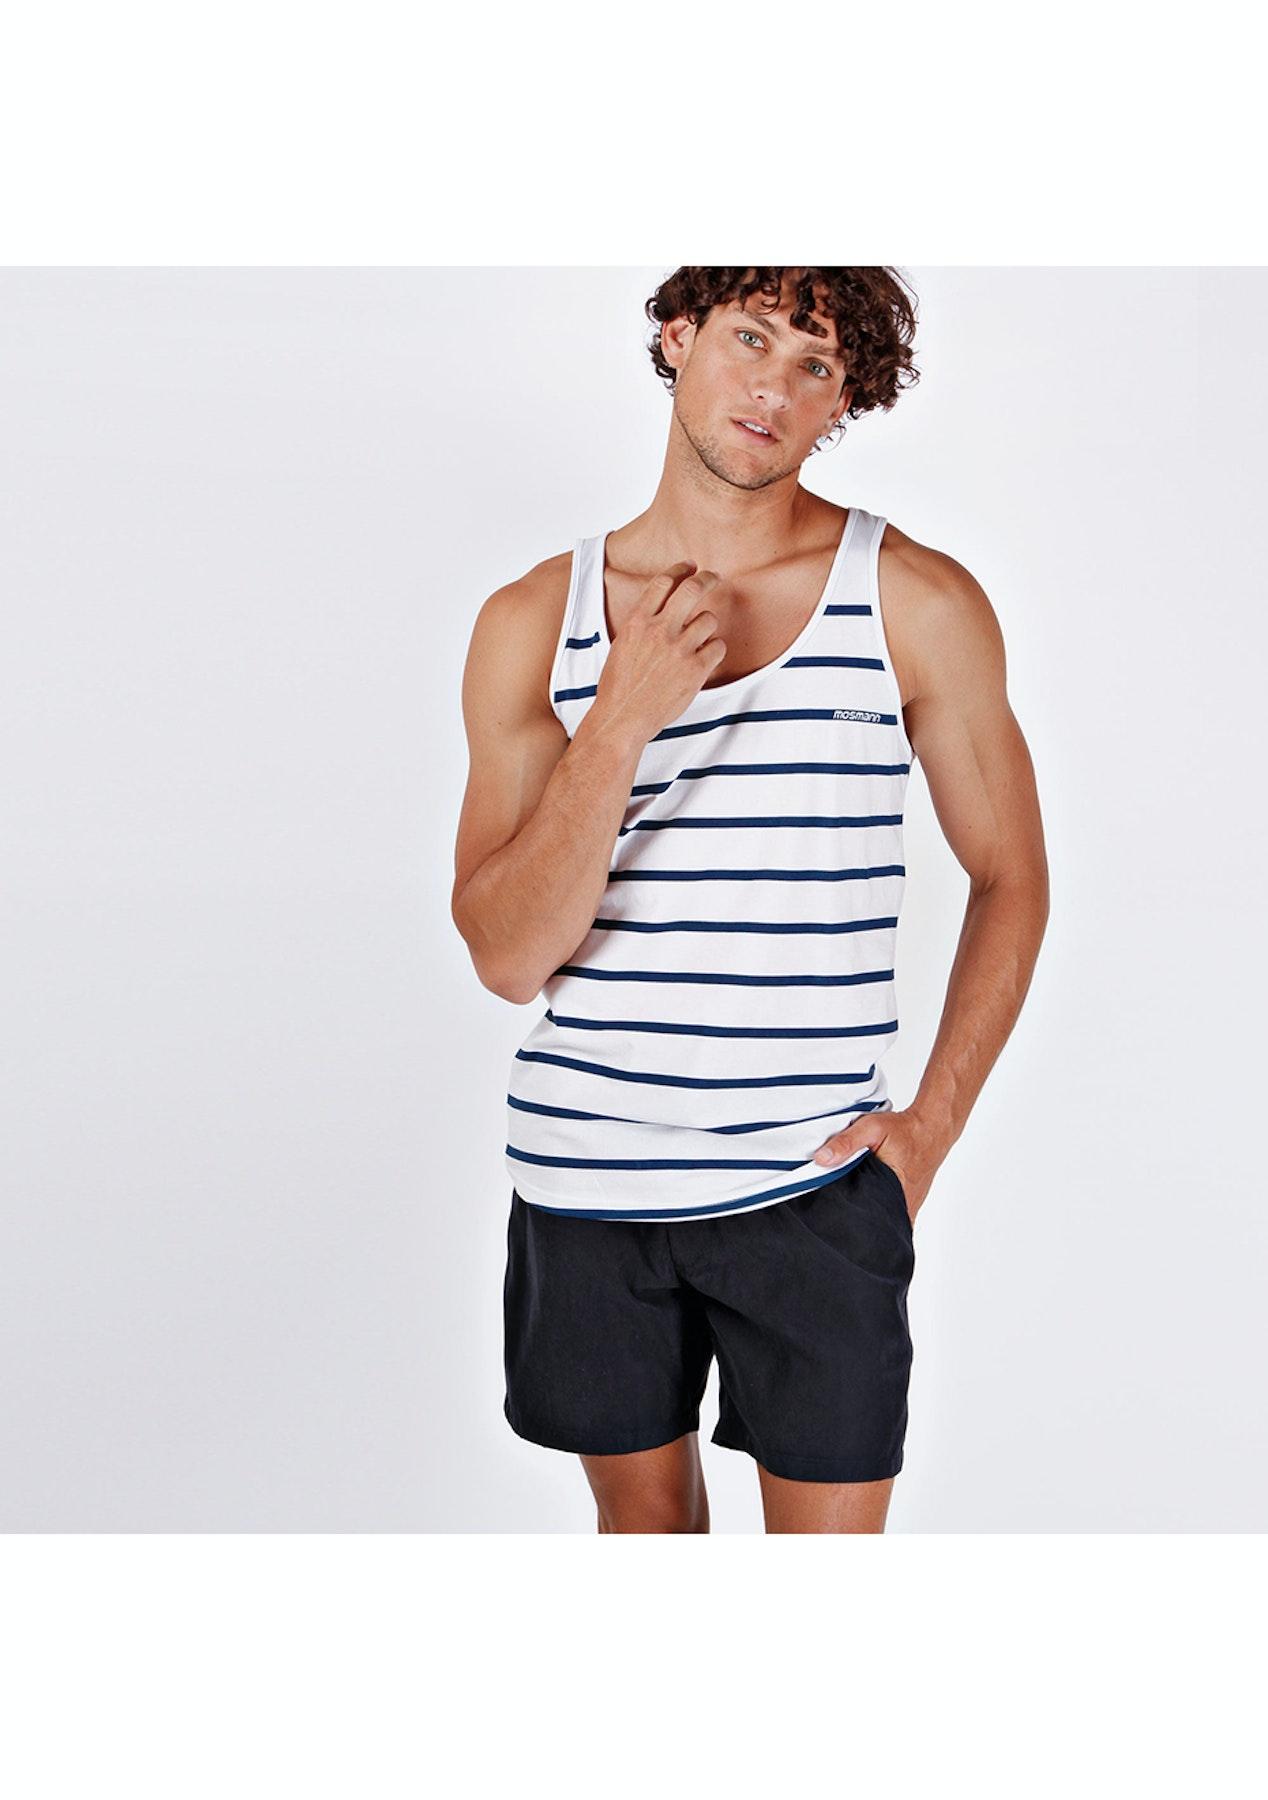 deaa921b4b Mosmann Australia - Resort Mid Swim Shorts - Navy Blue - Father's Day -  Express Shipping! - Onceit